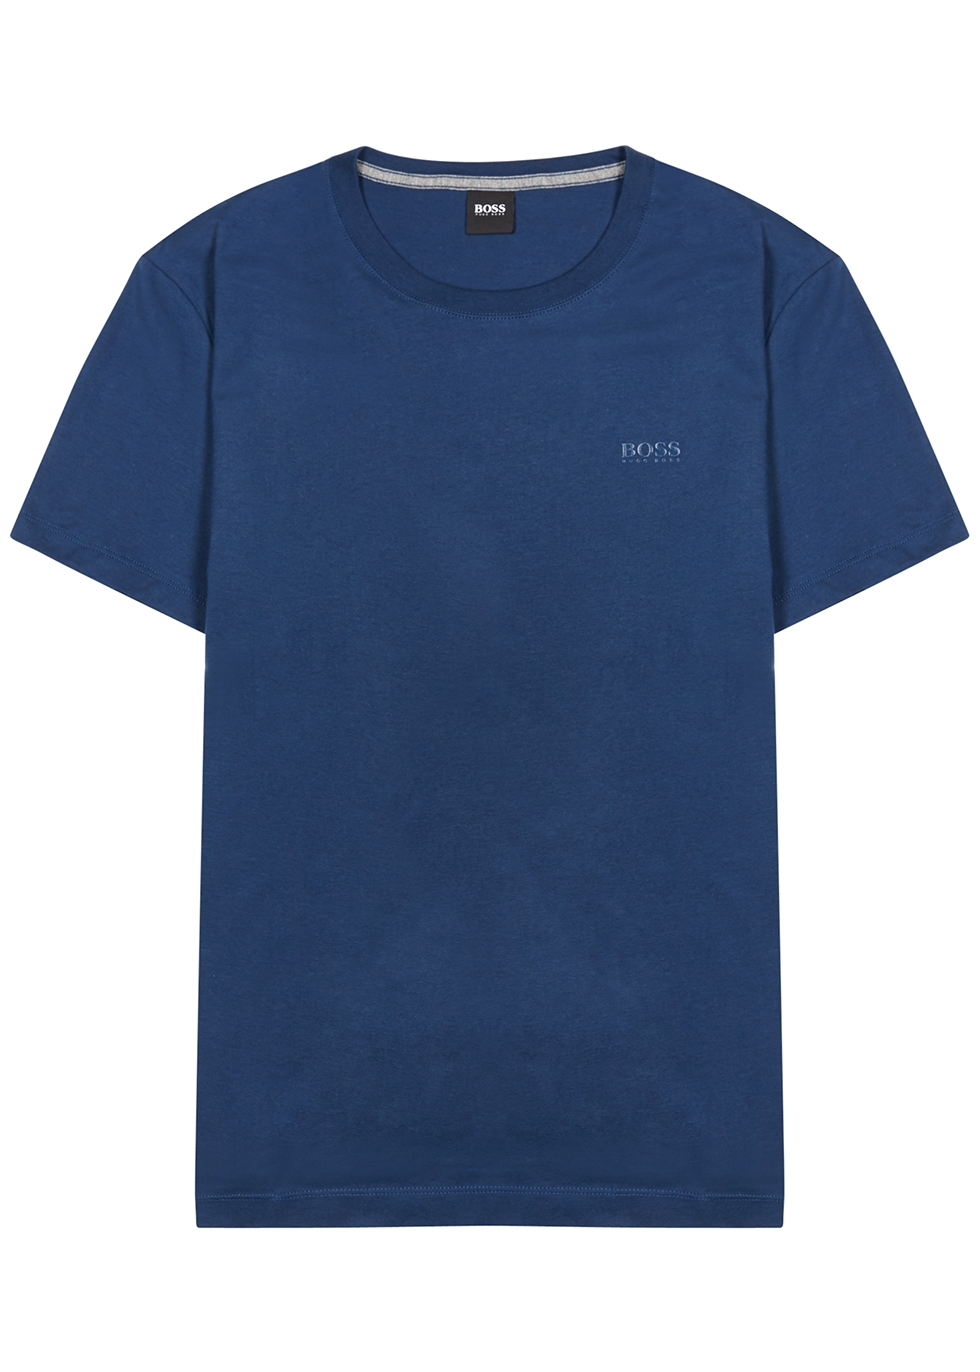 Tiburt navy logo cotton T-shirt